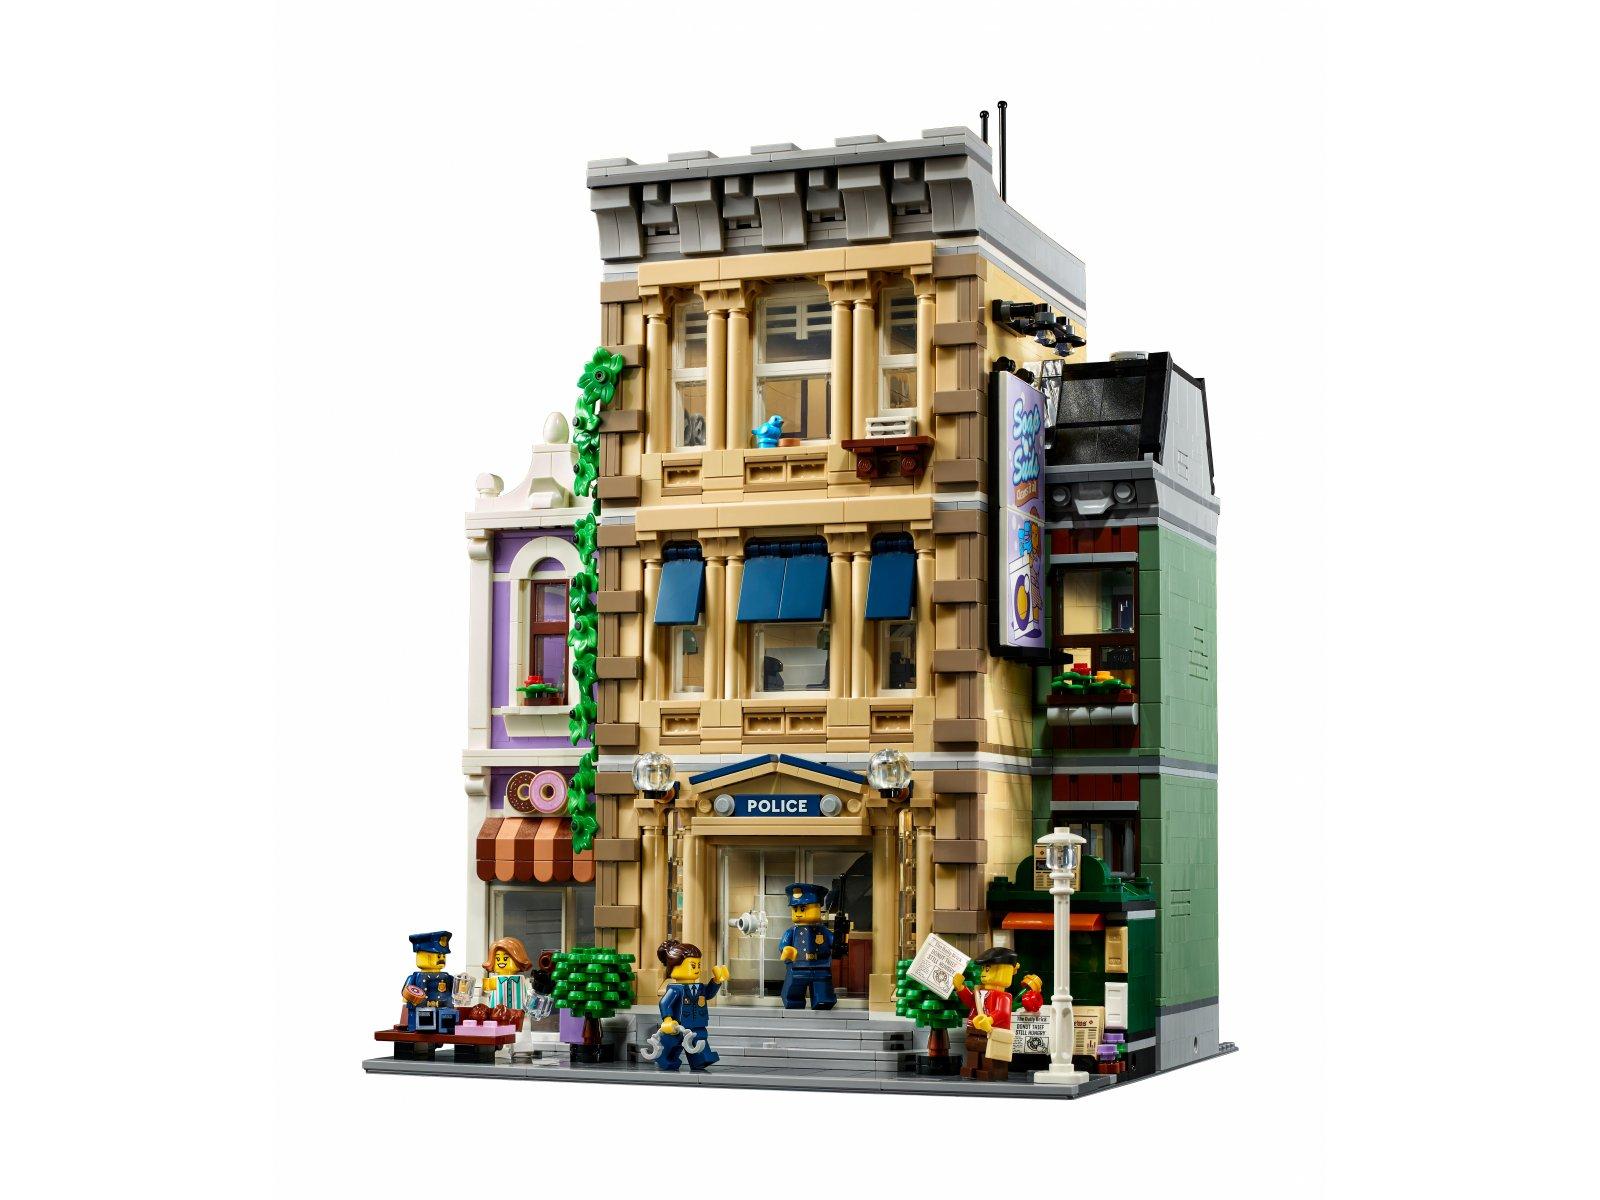 LEGO Posterunek policji 10278